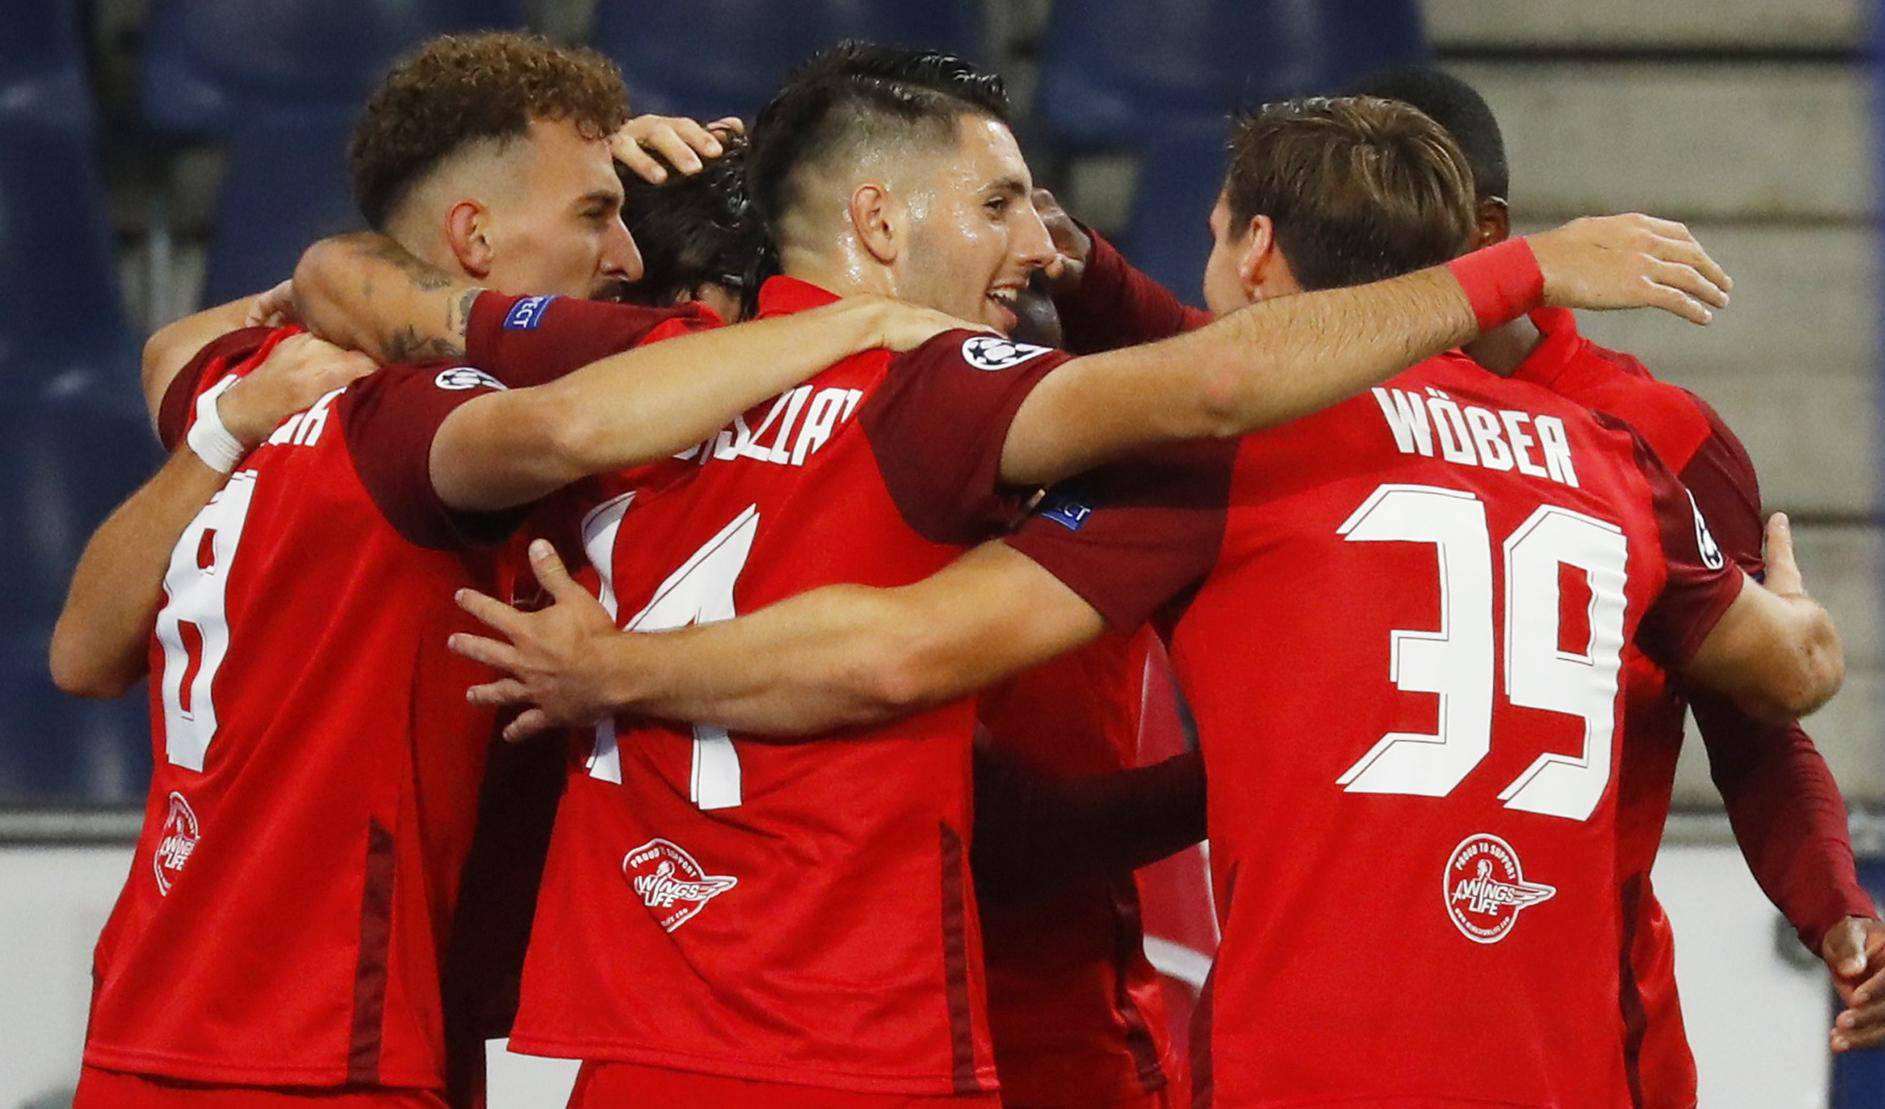 Champions League - Play-off - Second Leg - FC Red Bull Salzburg v Maccabi Tel Aviv